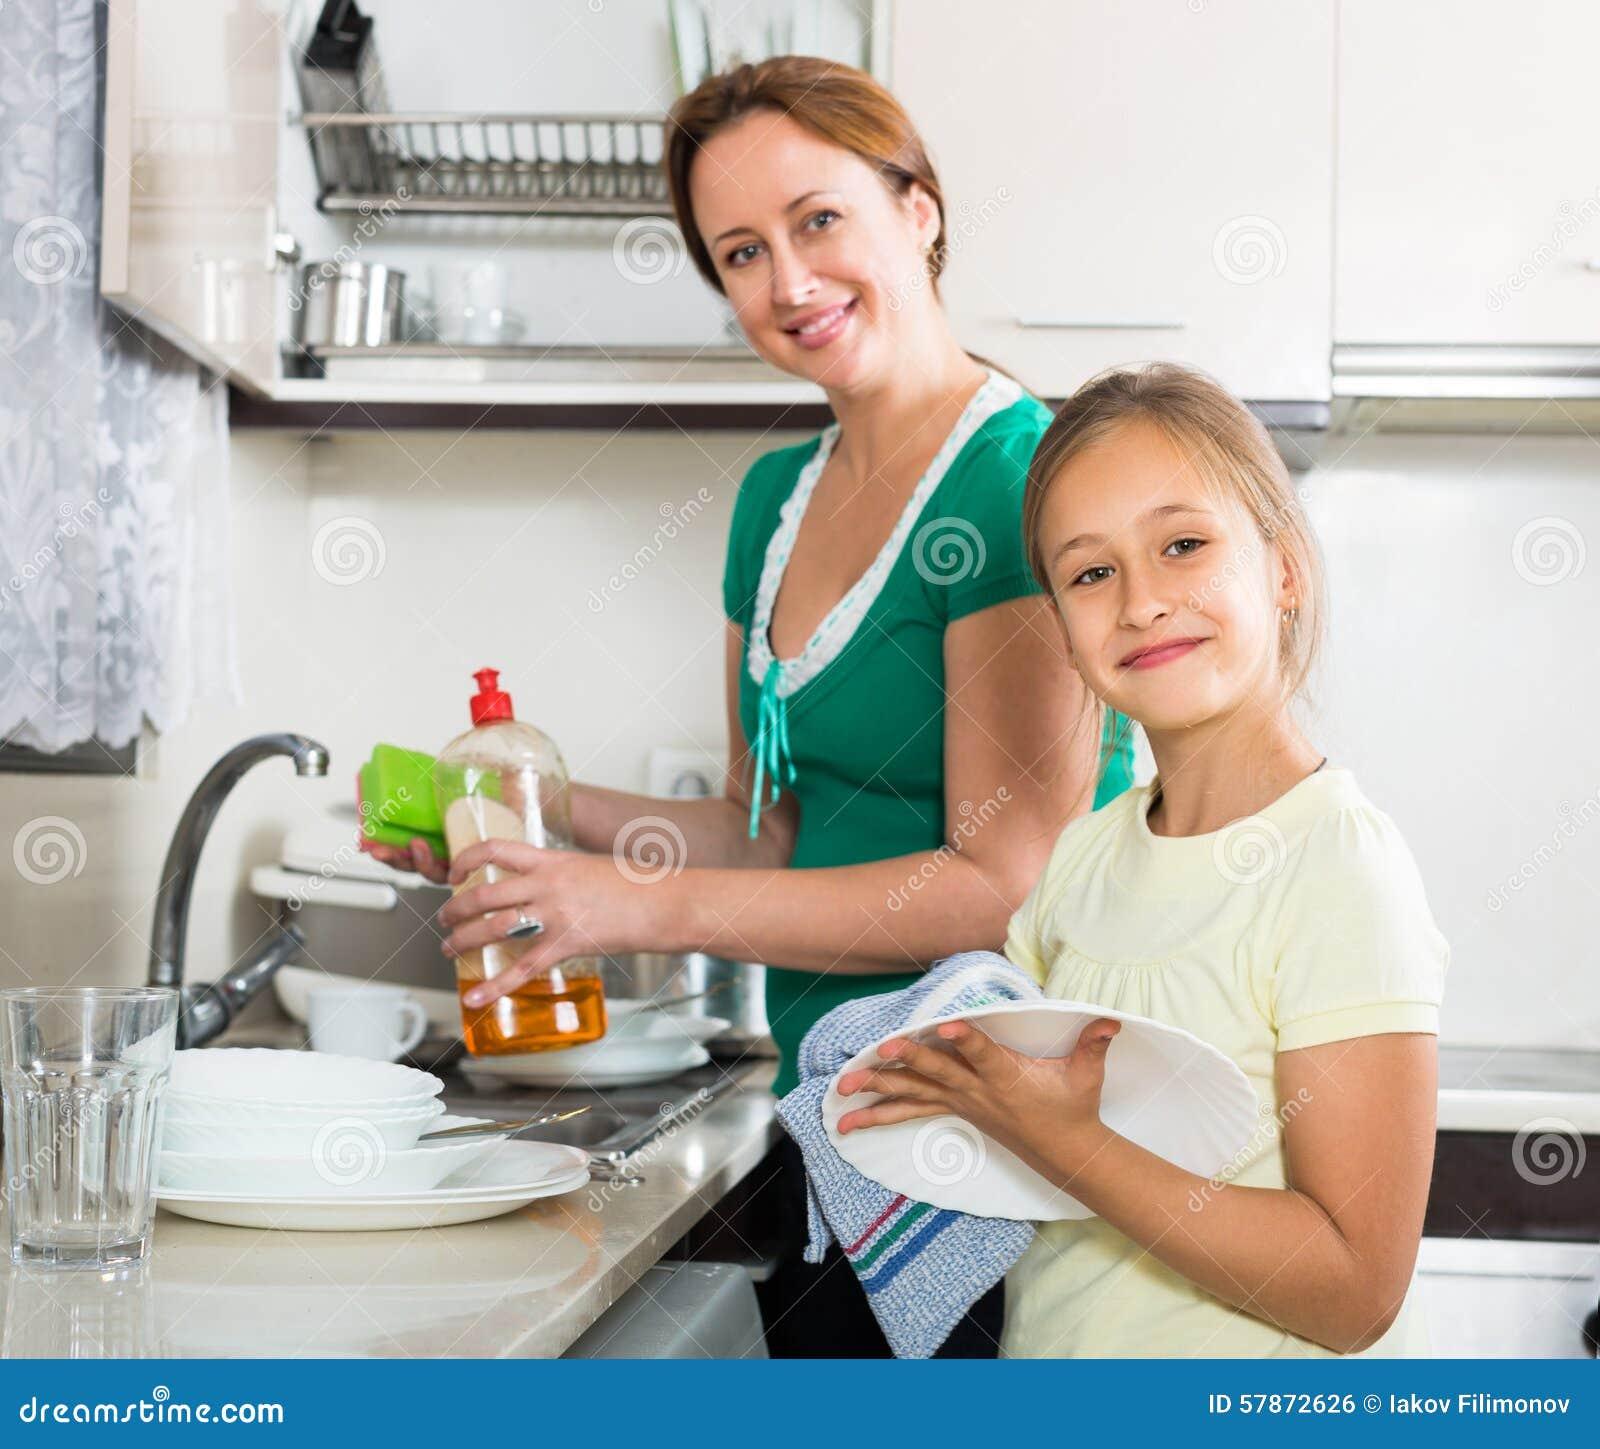 Girl Helping Mother Washing Dishes Stock Photo Image